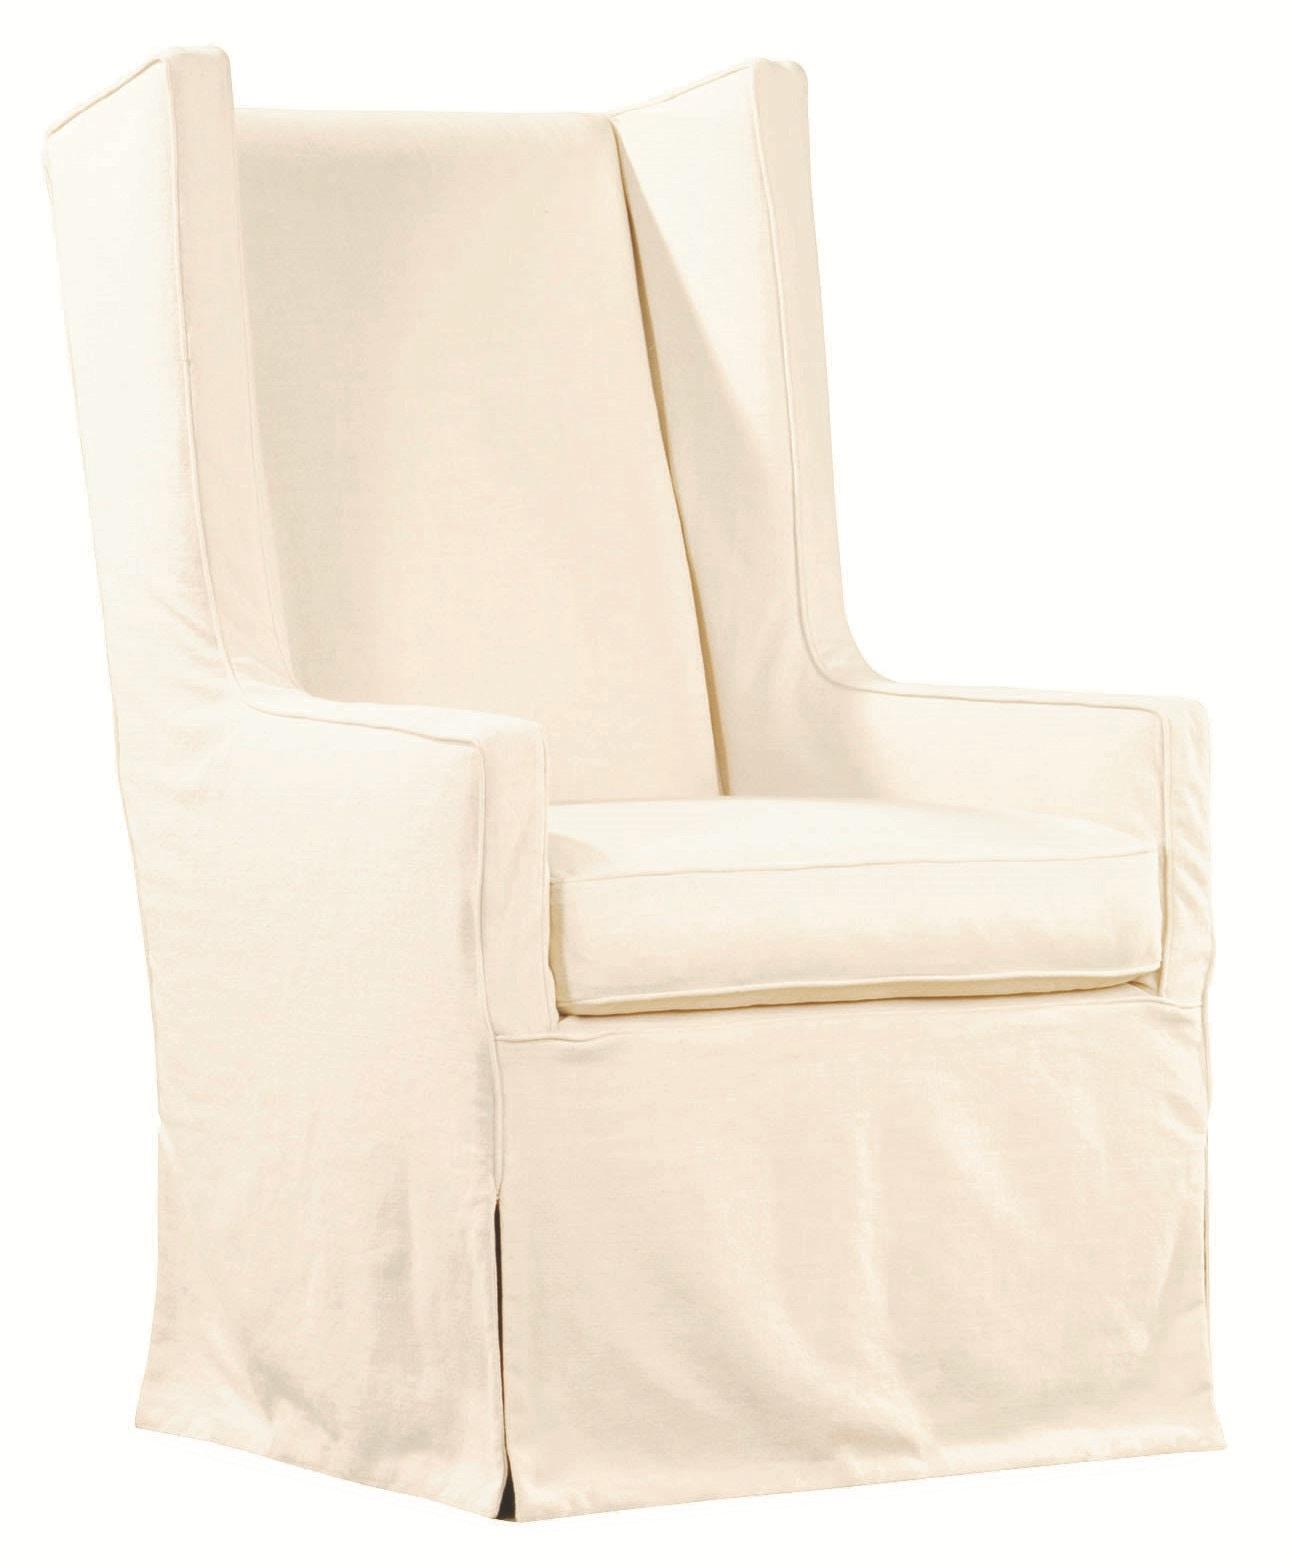 Lee Industries Slipcovered Host Chair C3915 41